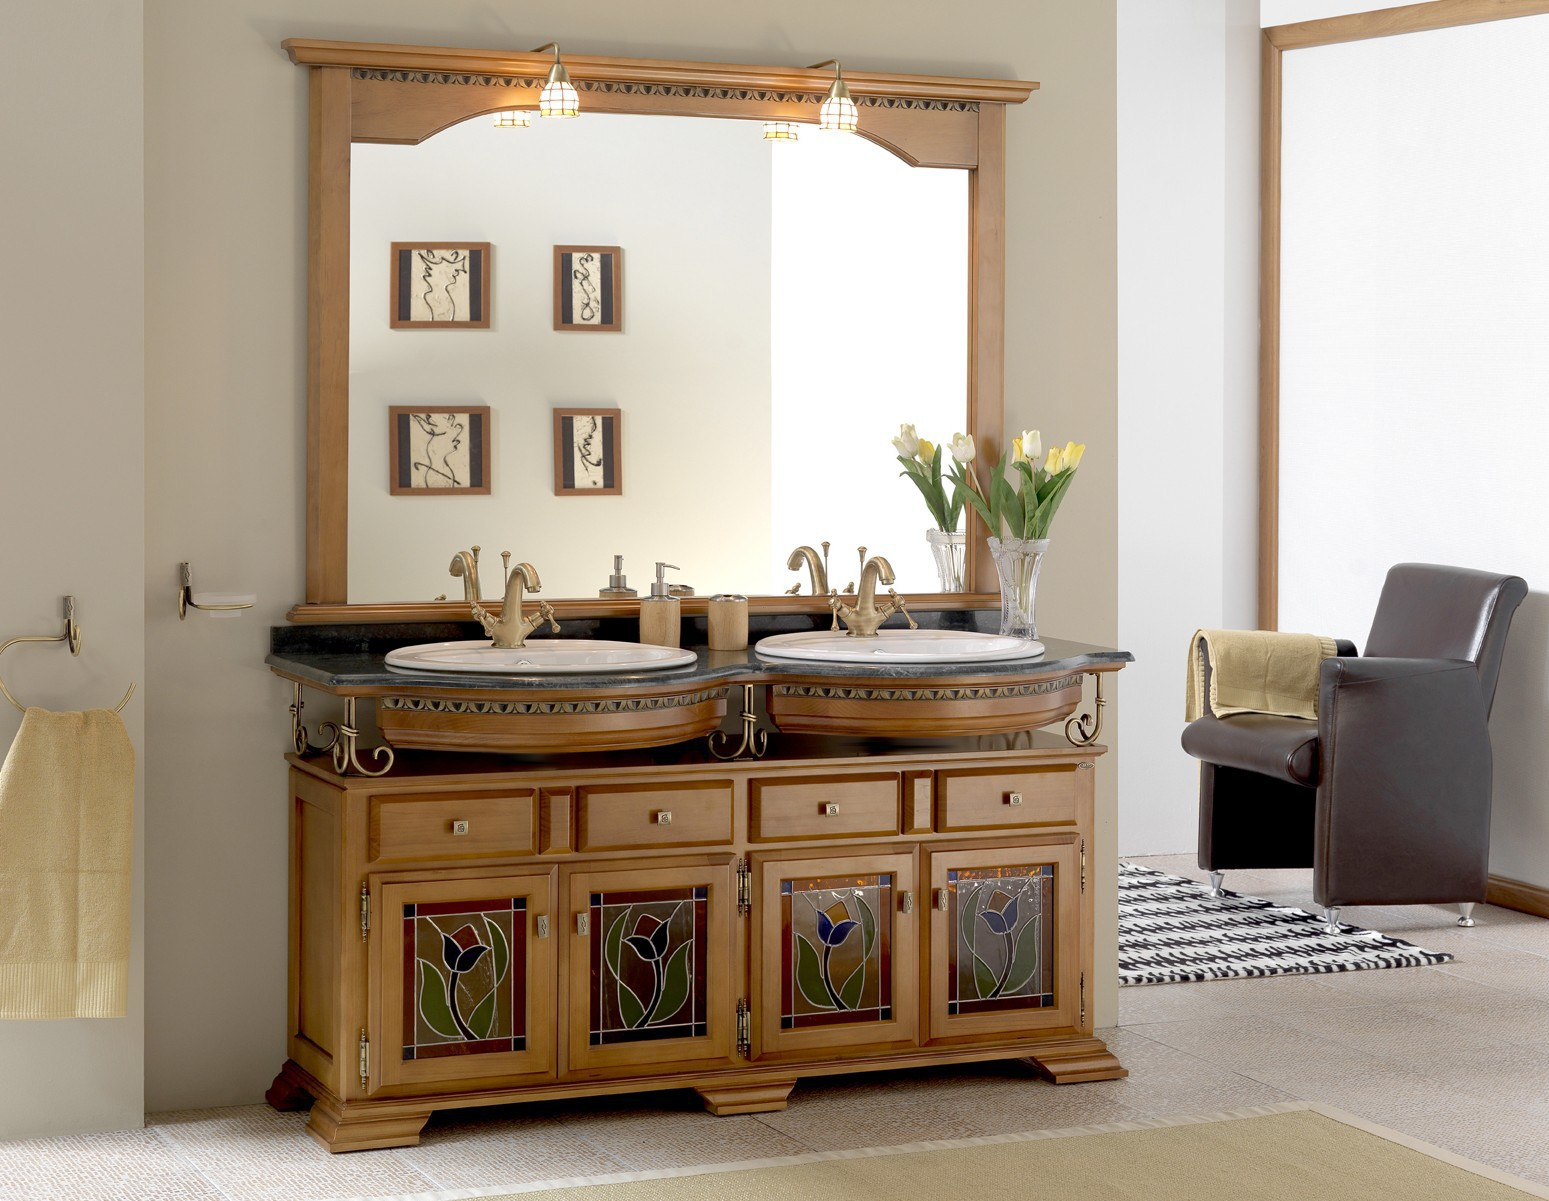 Mueble De Ba O Ruben Doble Muebles La Ilusi N # Muebles Doble Fondo